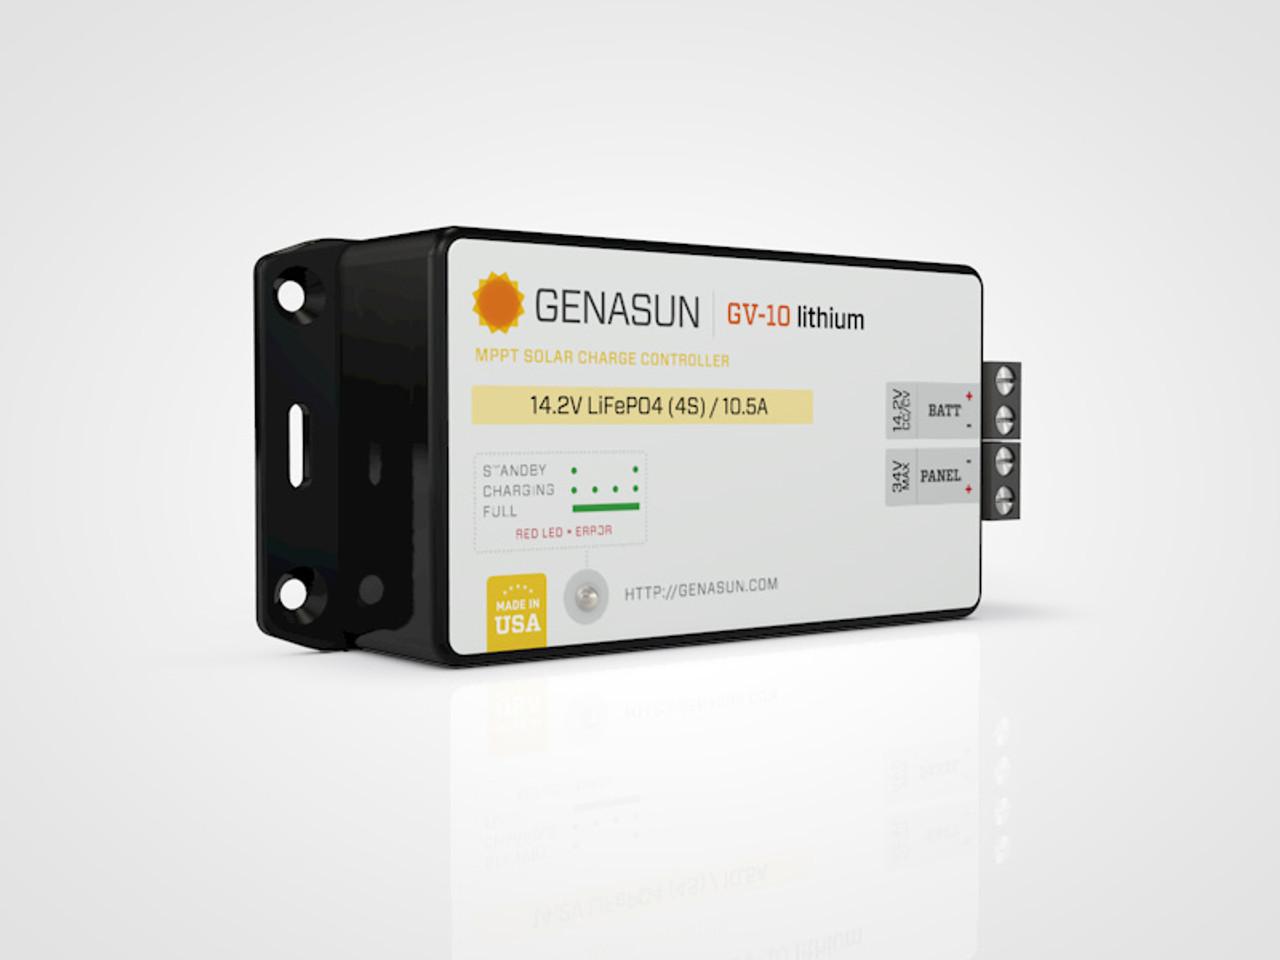 GV-10 | 140W 10A 14.6V Genasun MPPT Solar Charge Controller - Li - Left2